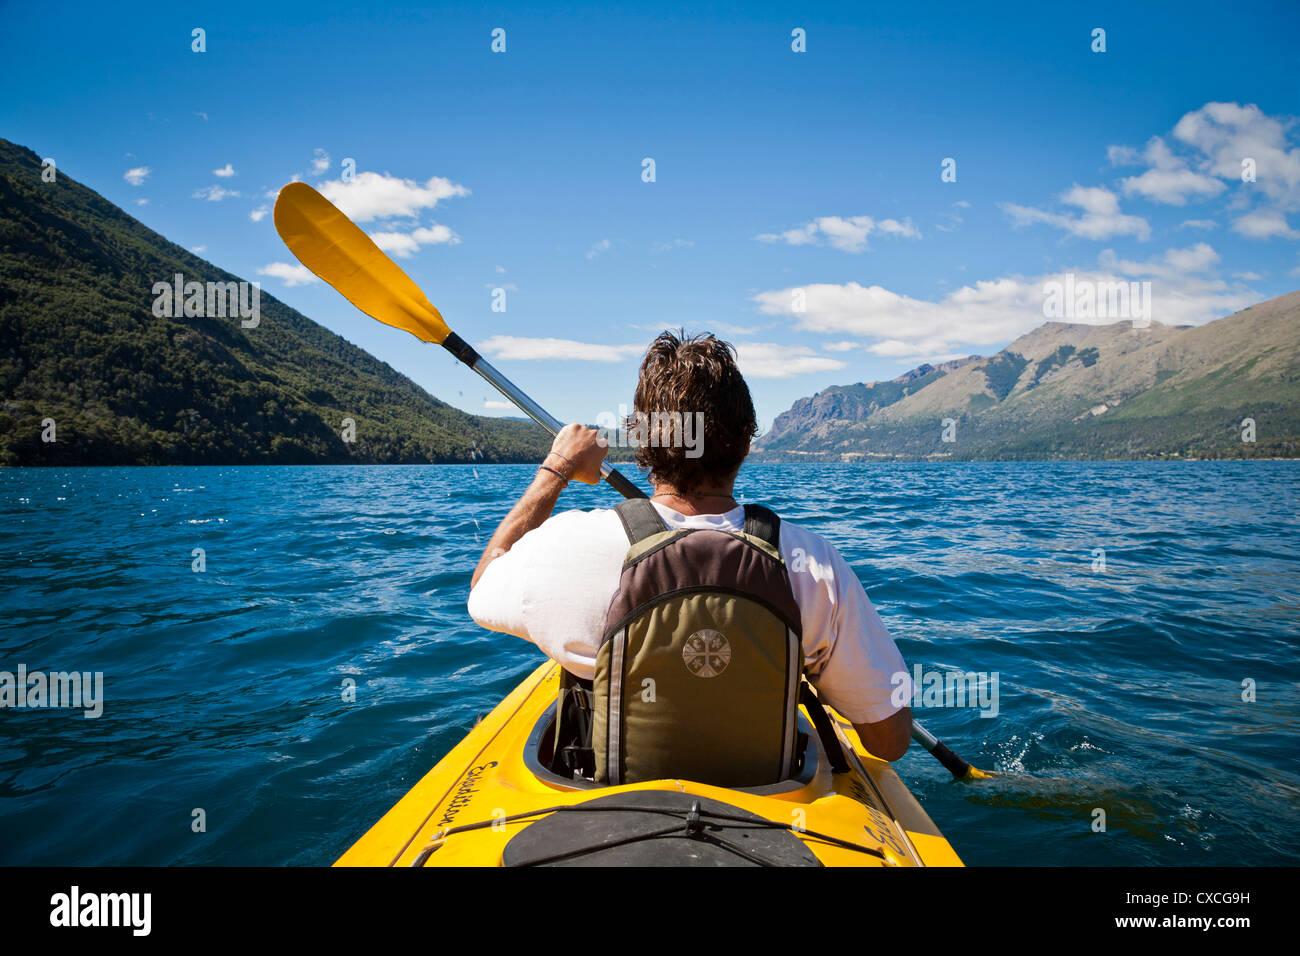 Kayakying à Guttierez Lake dans l'Estancia Hôtel Hue, Lakes District, Patagonie, Argentine. Photo Stock